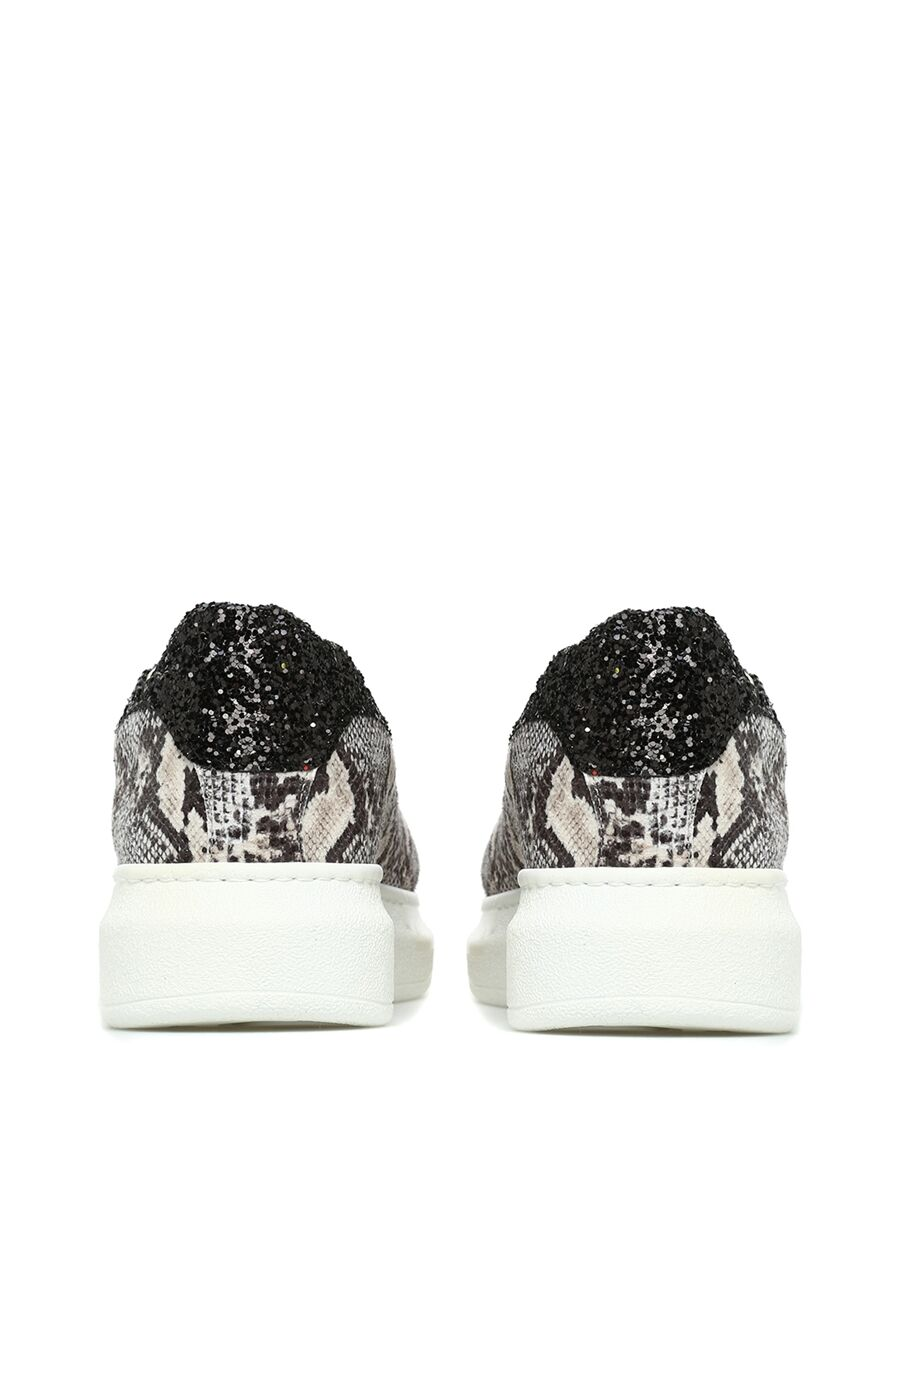 Yılan Baskı Vizon Sneaker